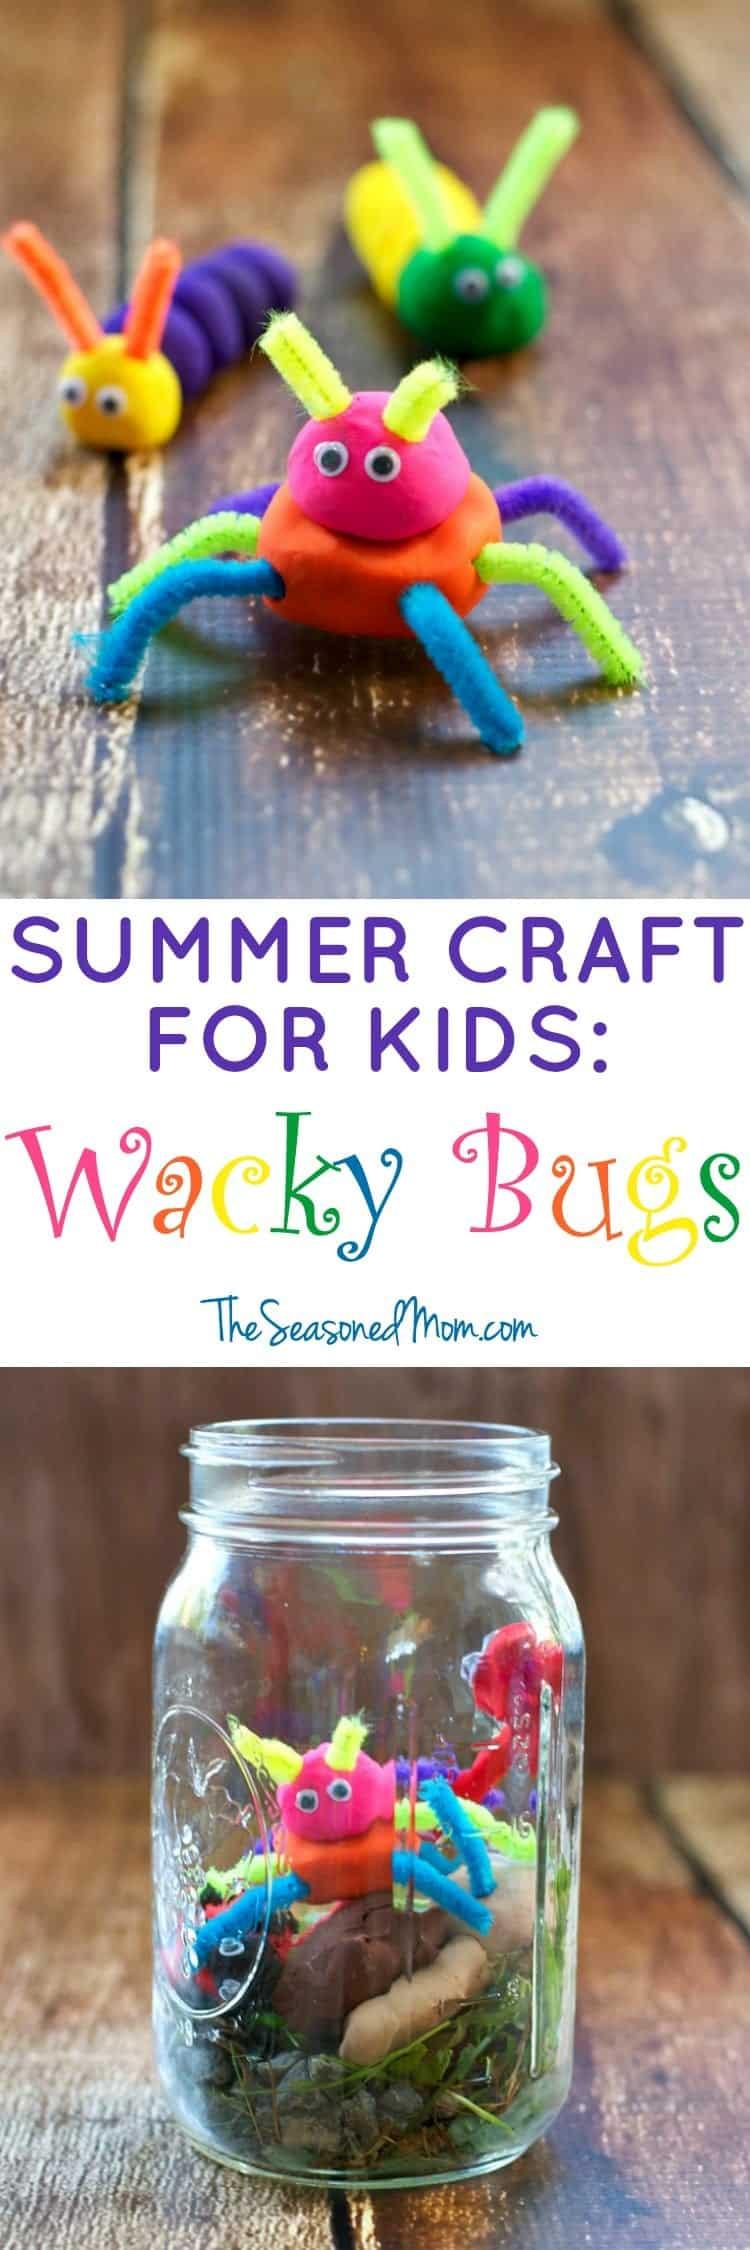 Summer Crafts For Children  Summer Craft for Kids Wacky Bugs The Seasoned Mom